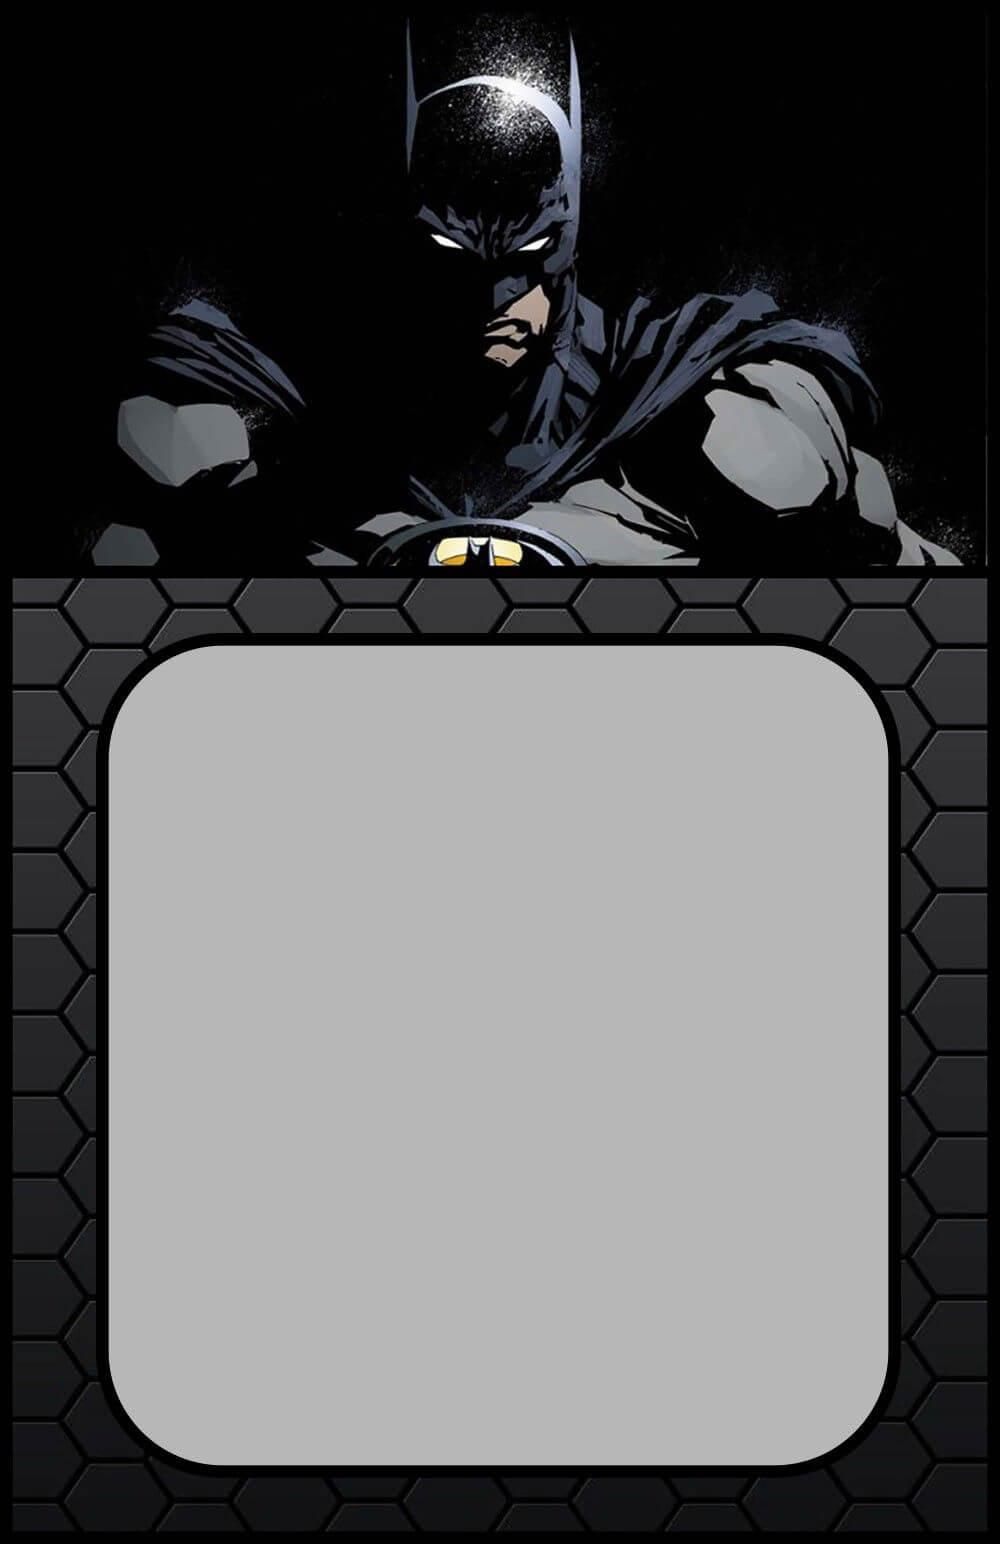 Printable Batman Invitation Card   Batman Invitations With Batman Birthday Card Template